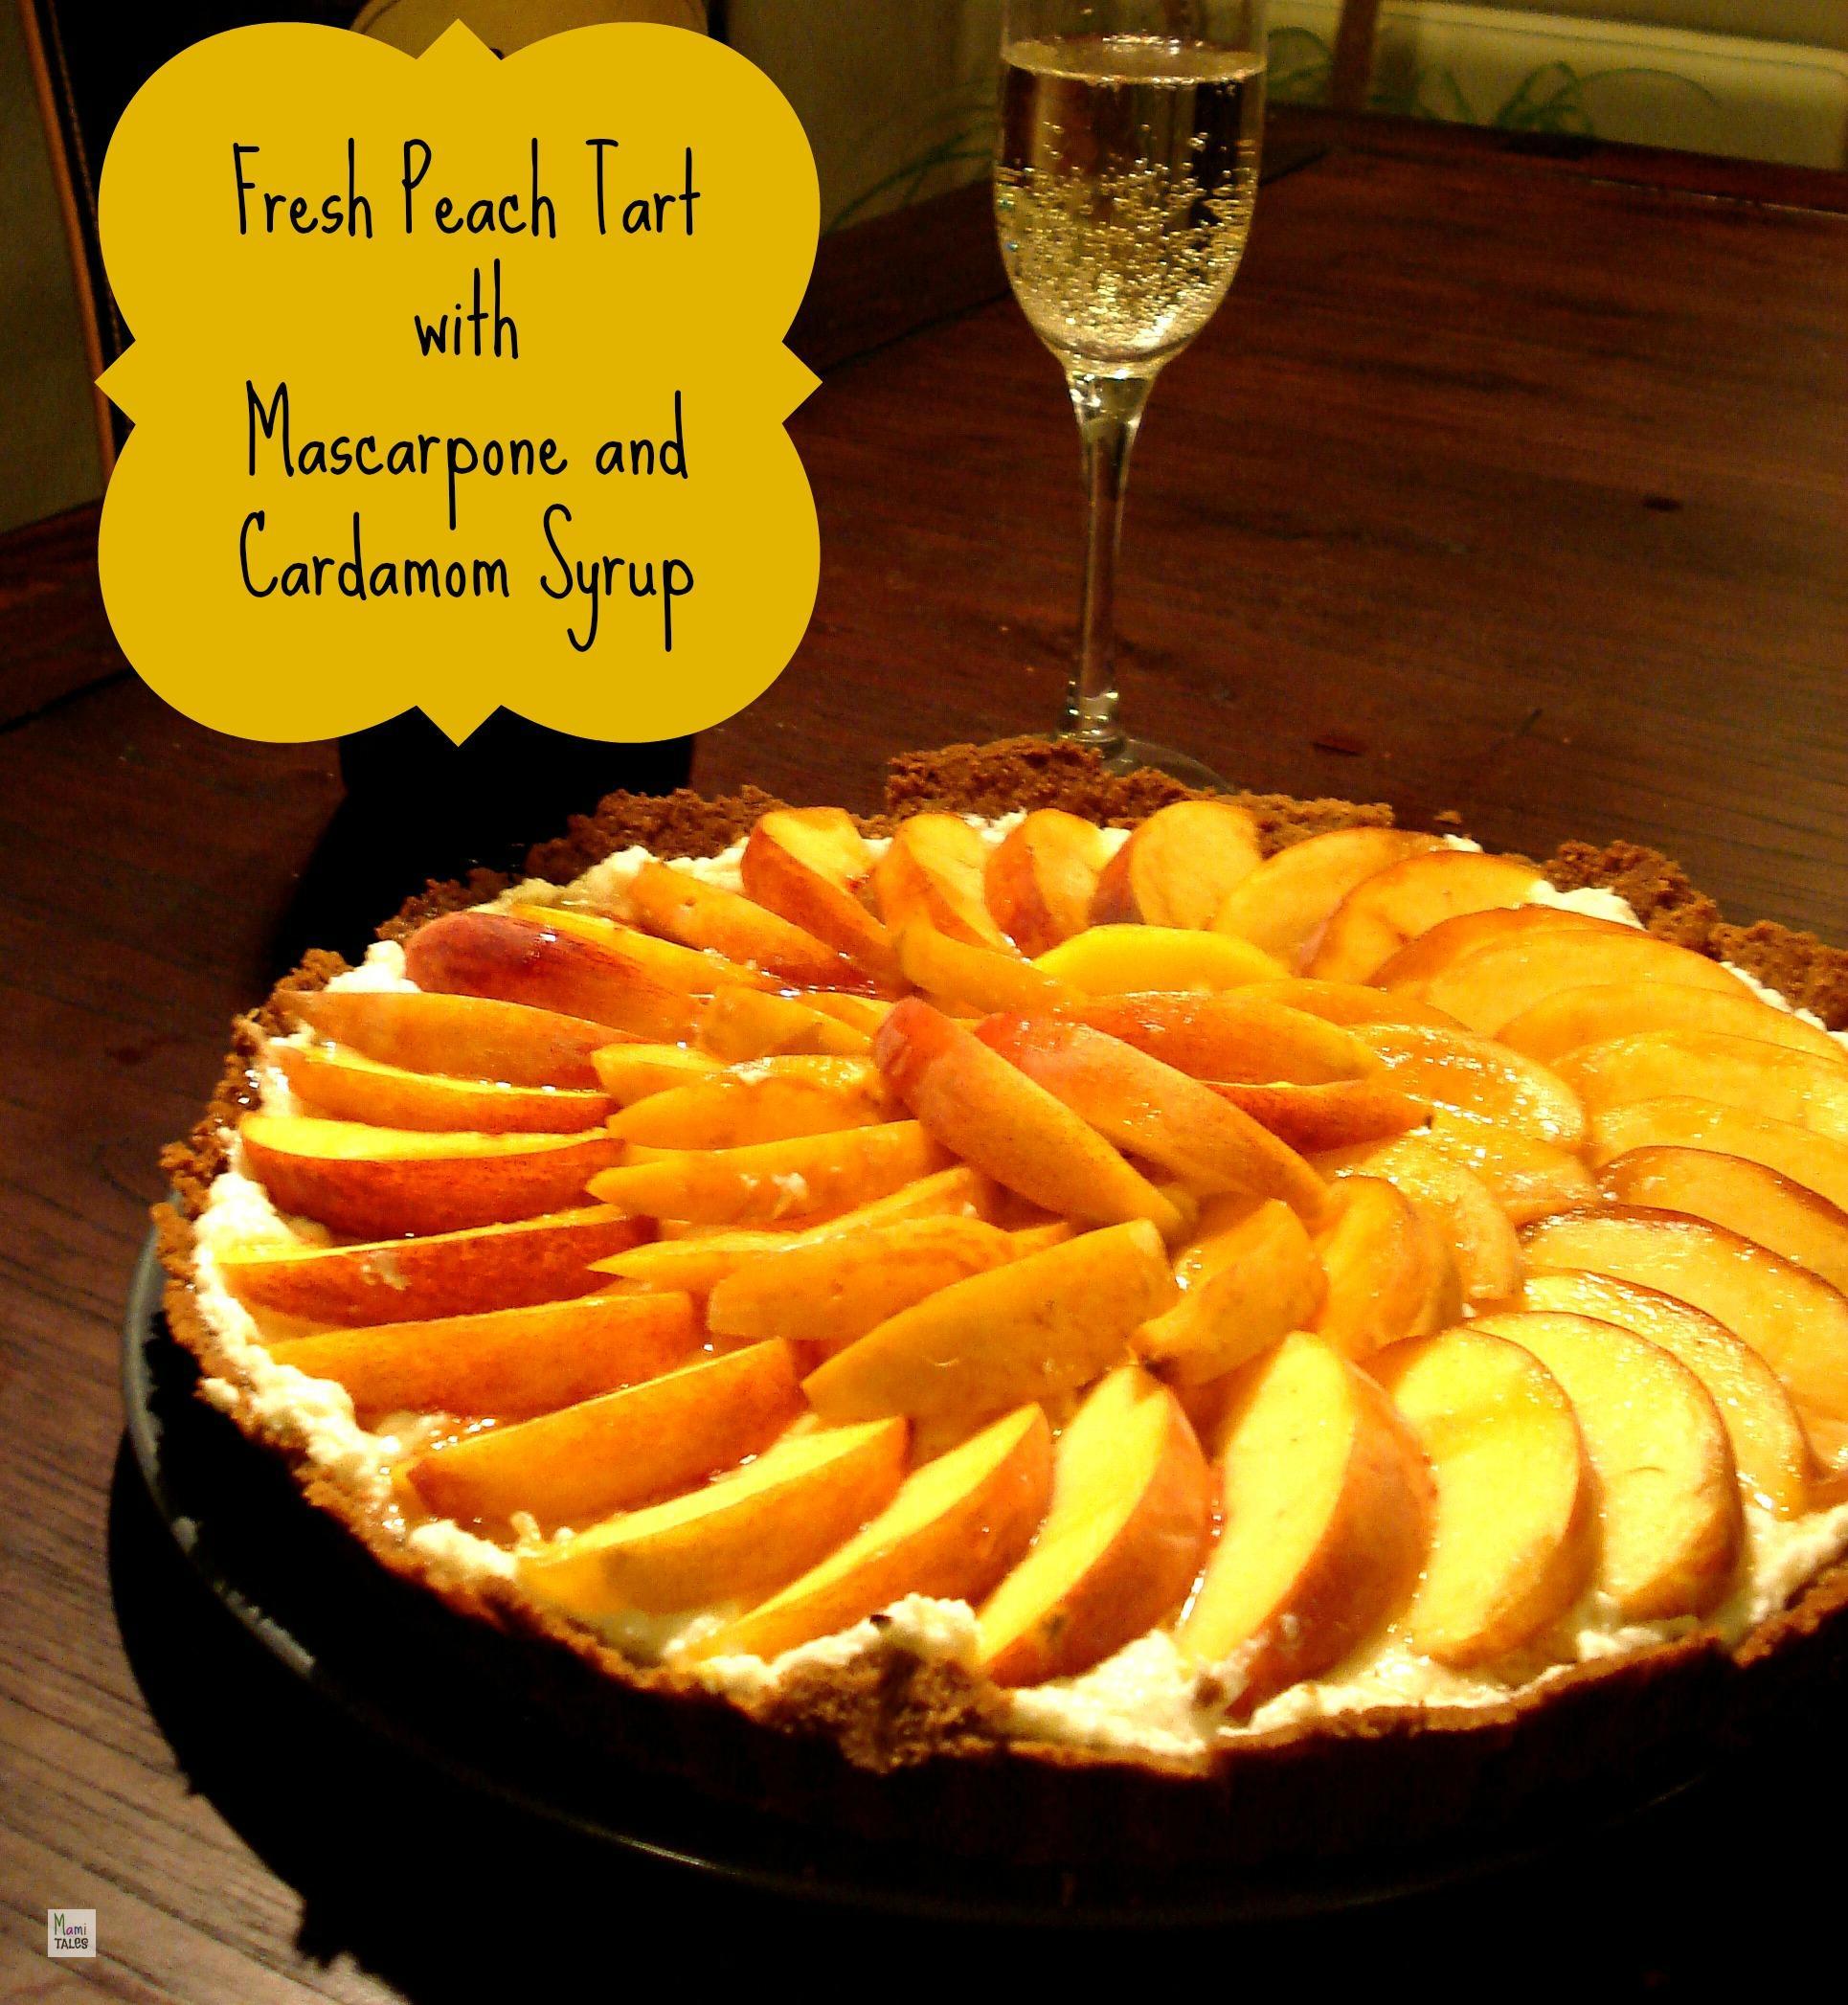 Peach Tart with Mascarpone and Cardamom - Mami Tales